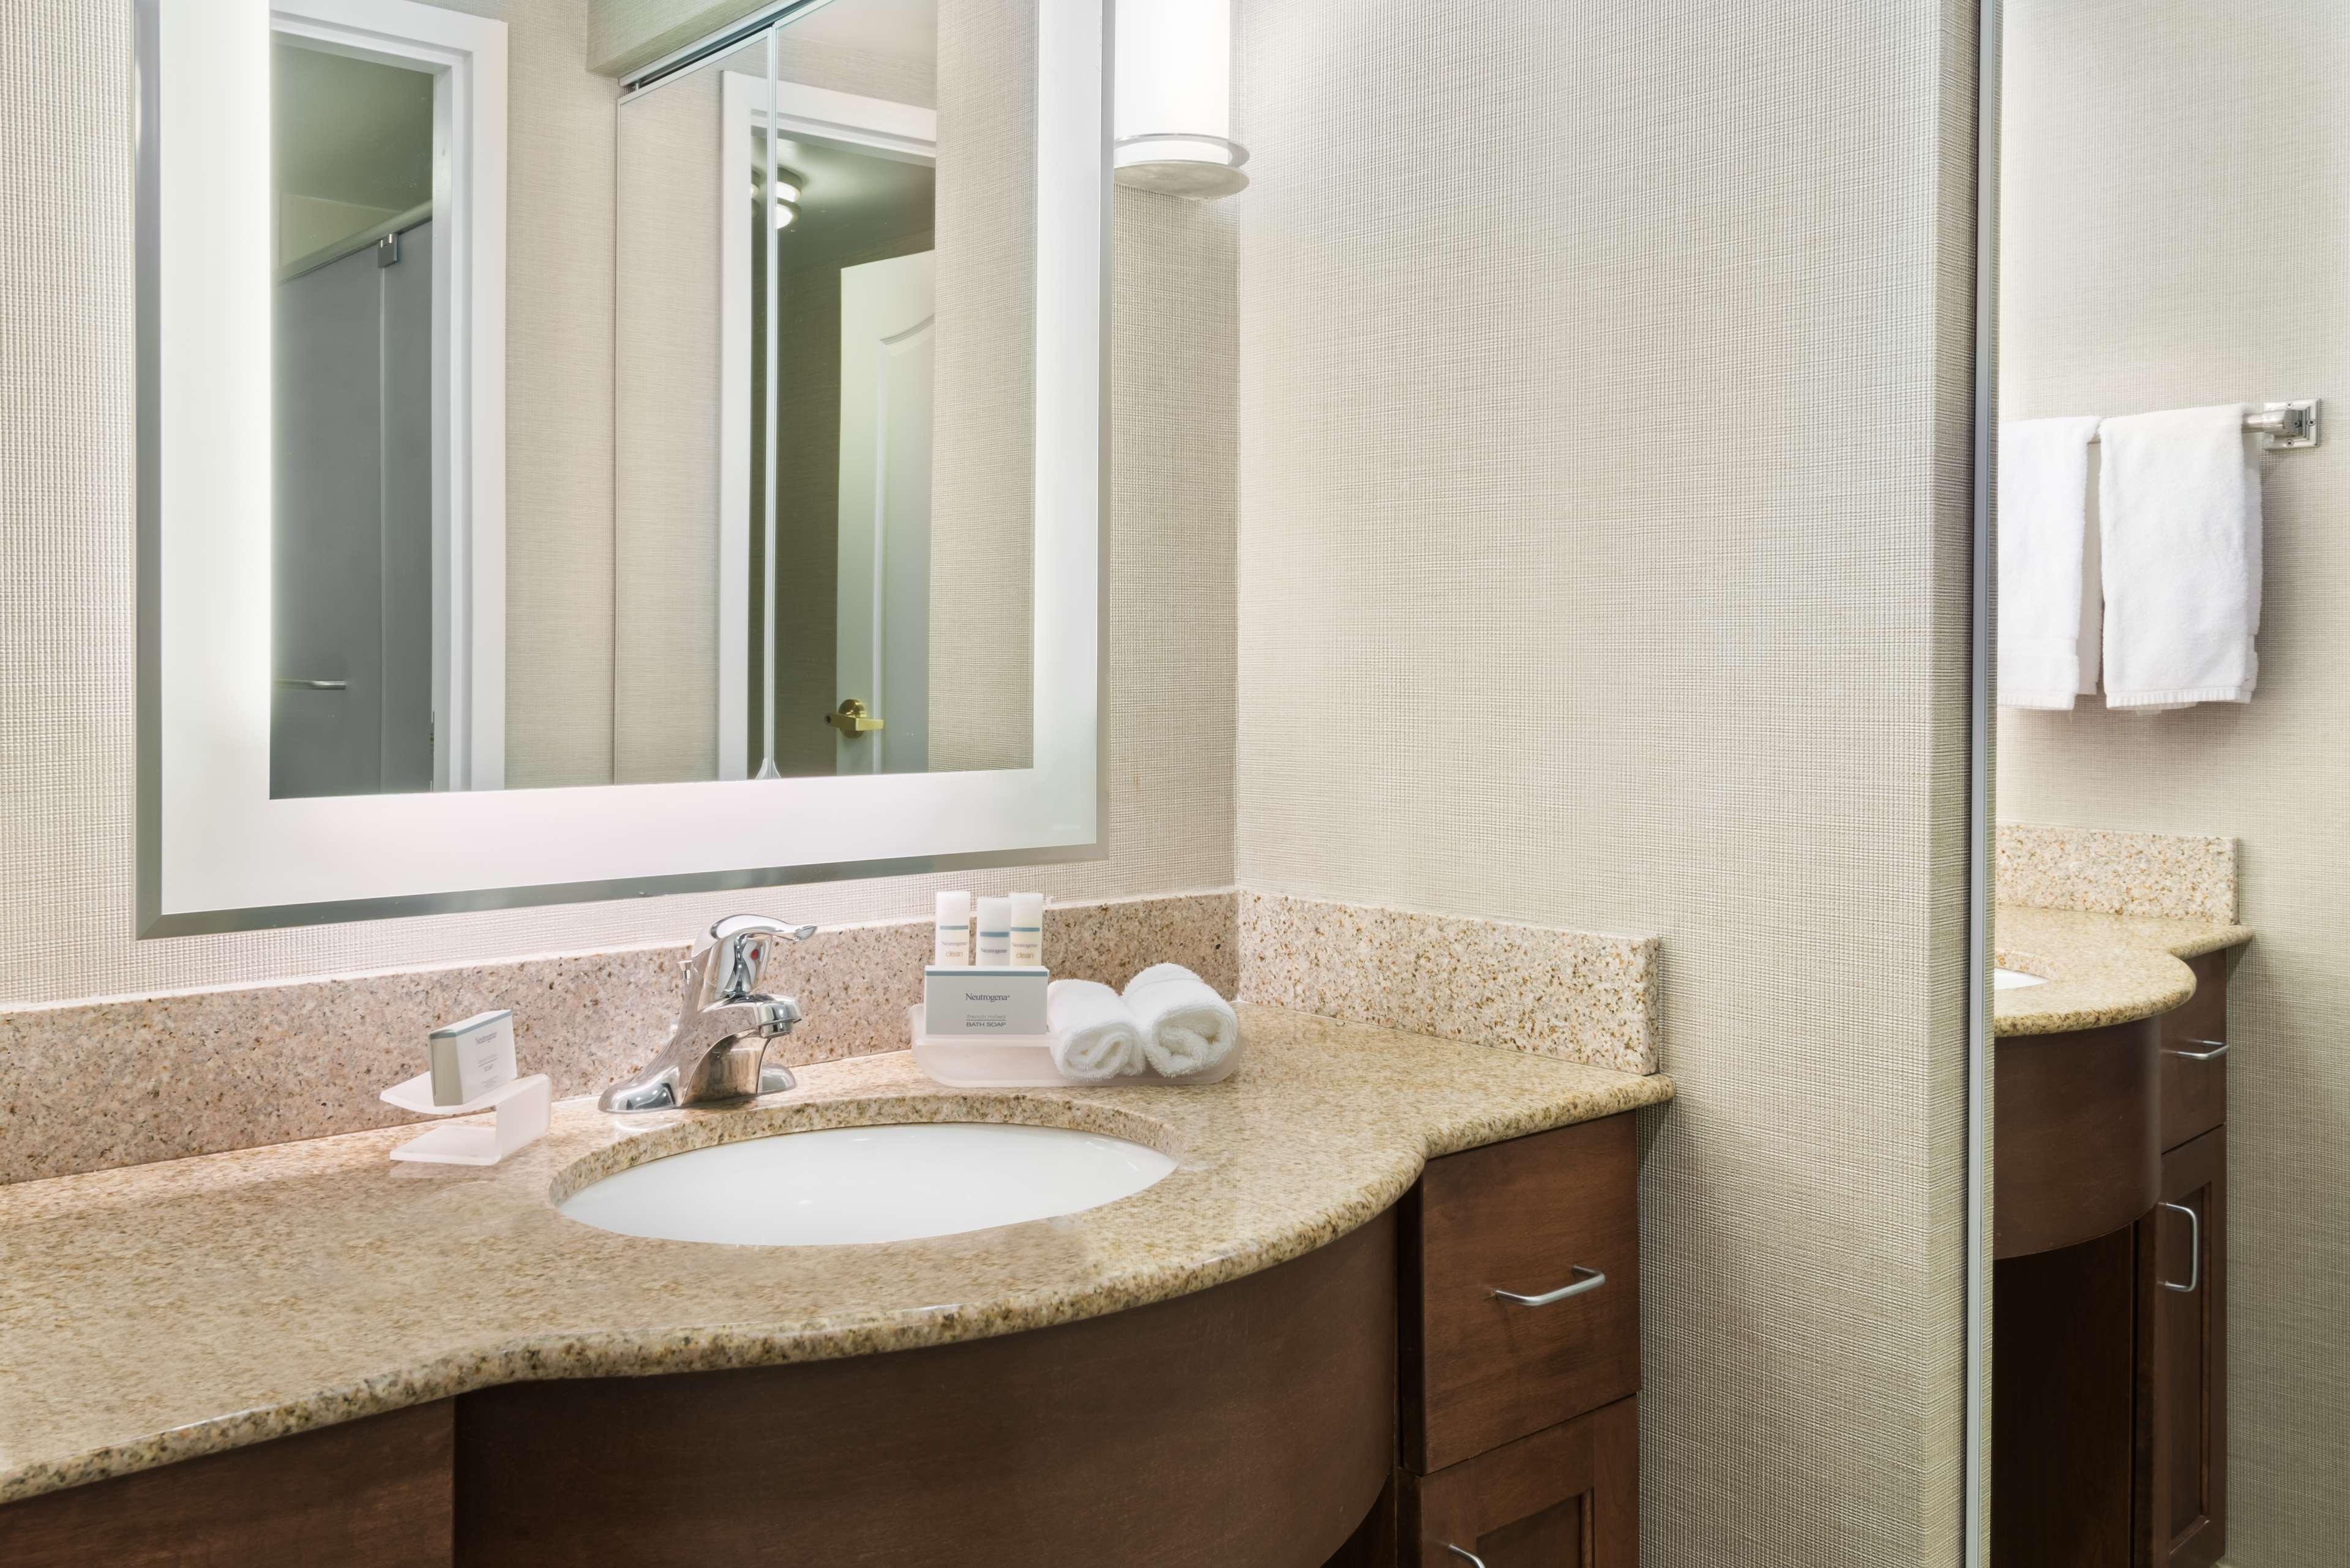 Homewood Suites by Hilton Holyoke-Springfield/North image 27